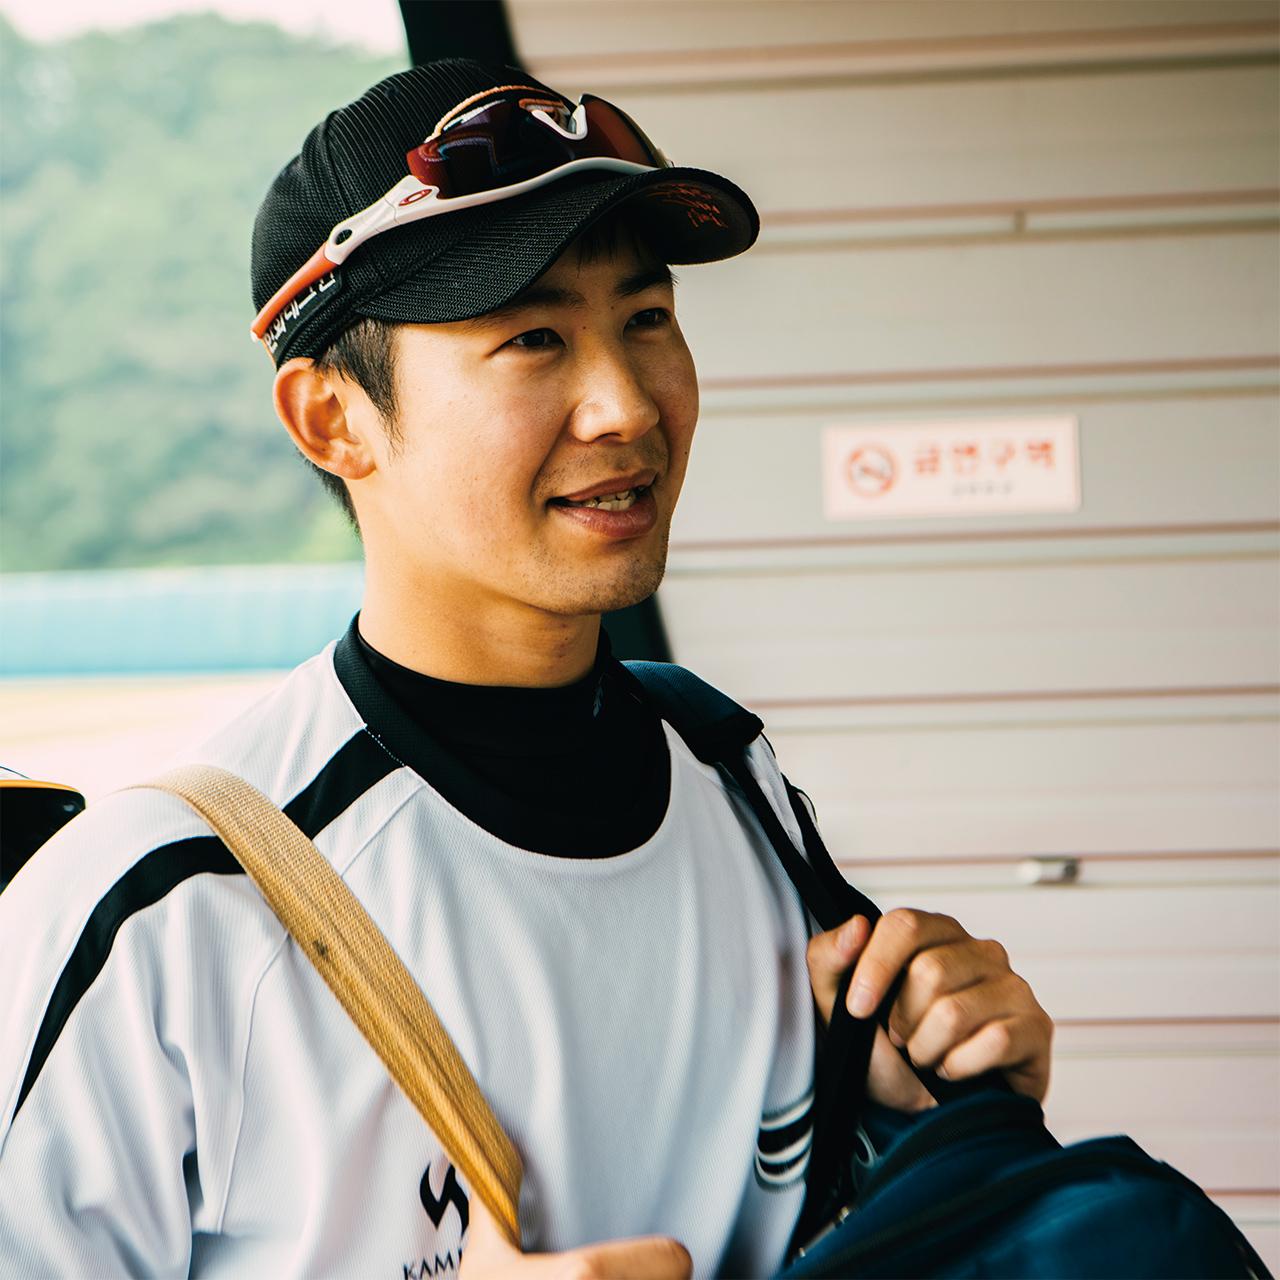 "<strong>조성래(13번, 1990년생), 내야수</strong><br/>""제가 야구를 안 할 때도 야구장 가서 프로들 경기하는 것 보면 심장이 막 뛰더라고요. '내가 저기에 있었다면 이렇게 할 것 같은데' 싶었고요. 절실한 마음으로 왔습니다."""